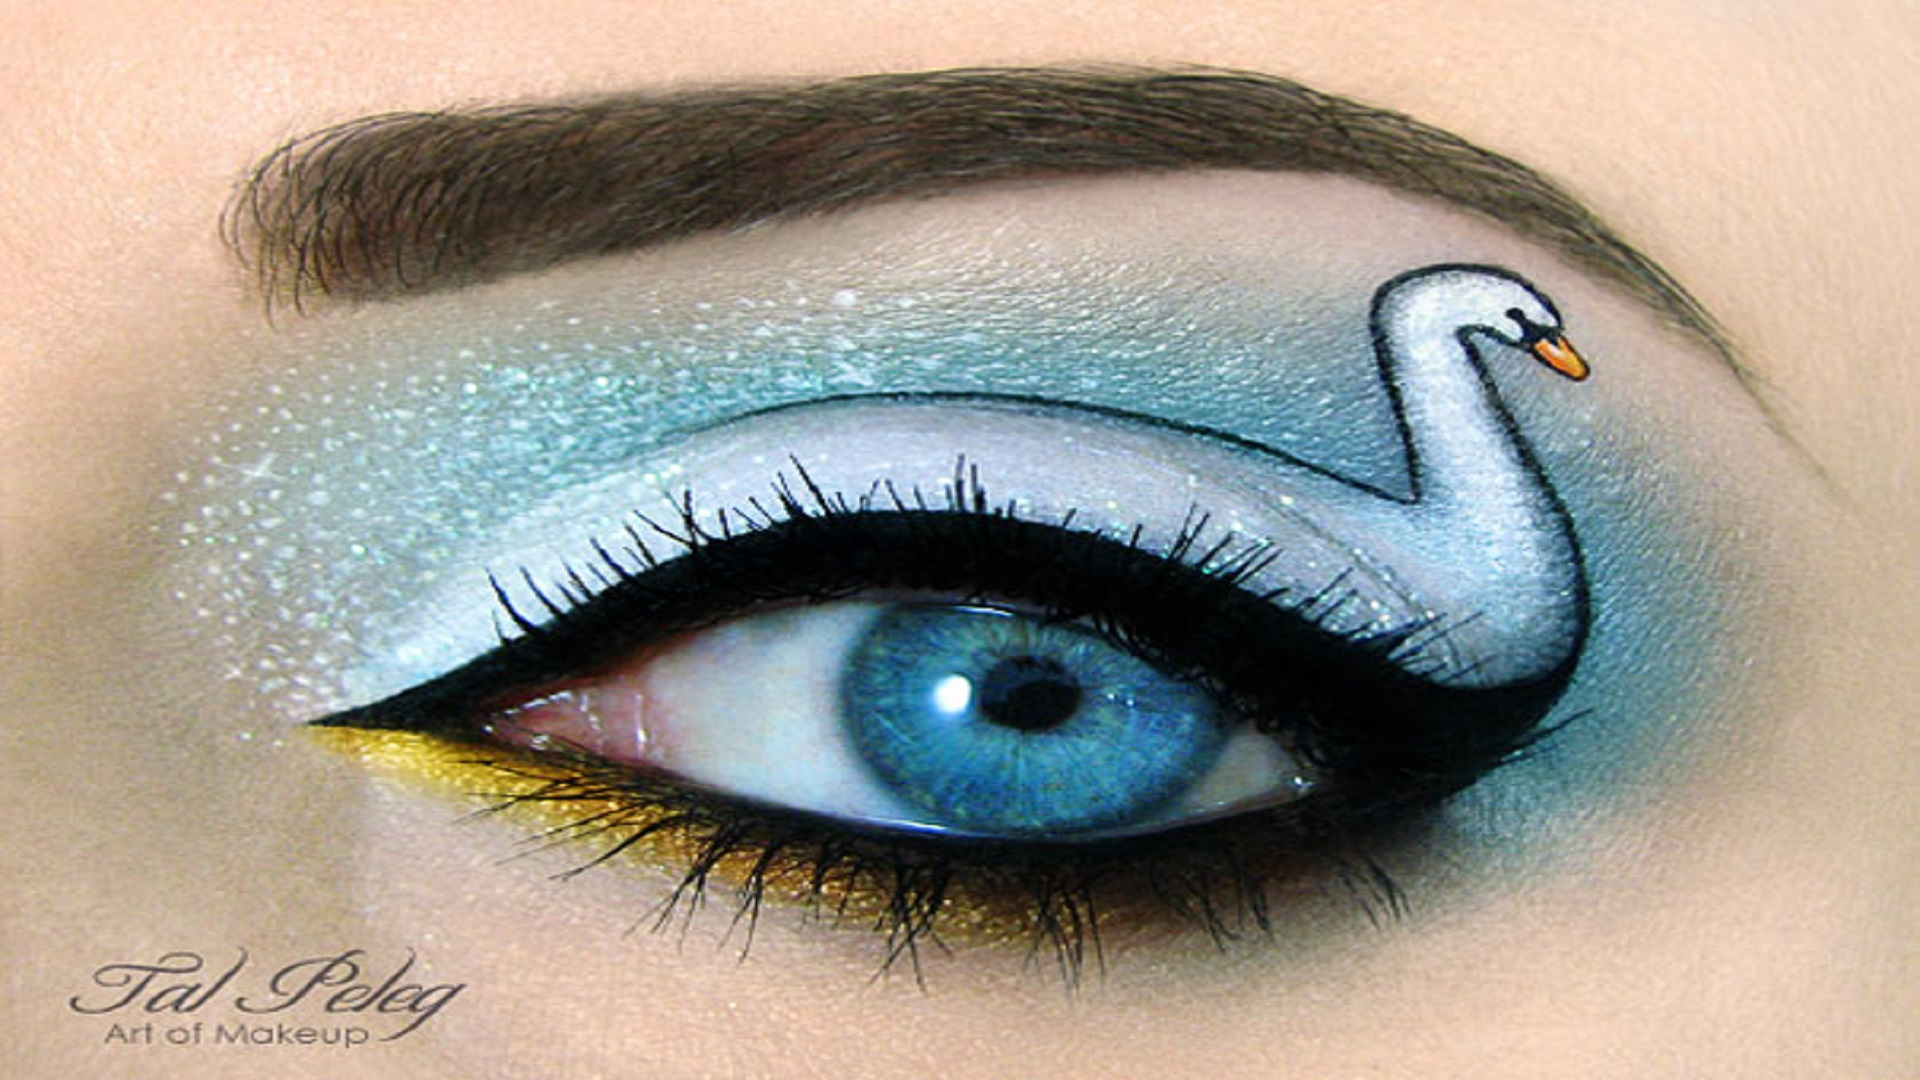 make-up-art-tal-peleg-free-hd-wallpapers